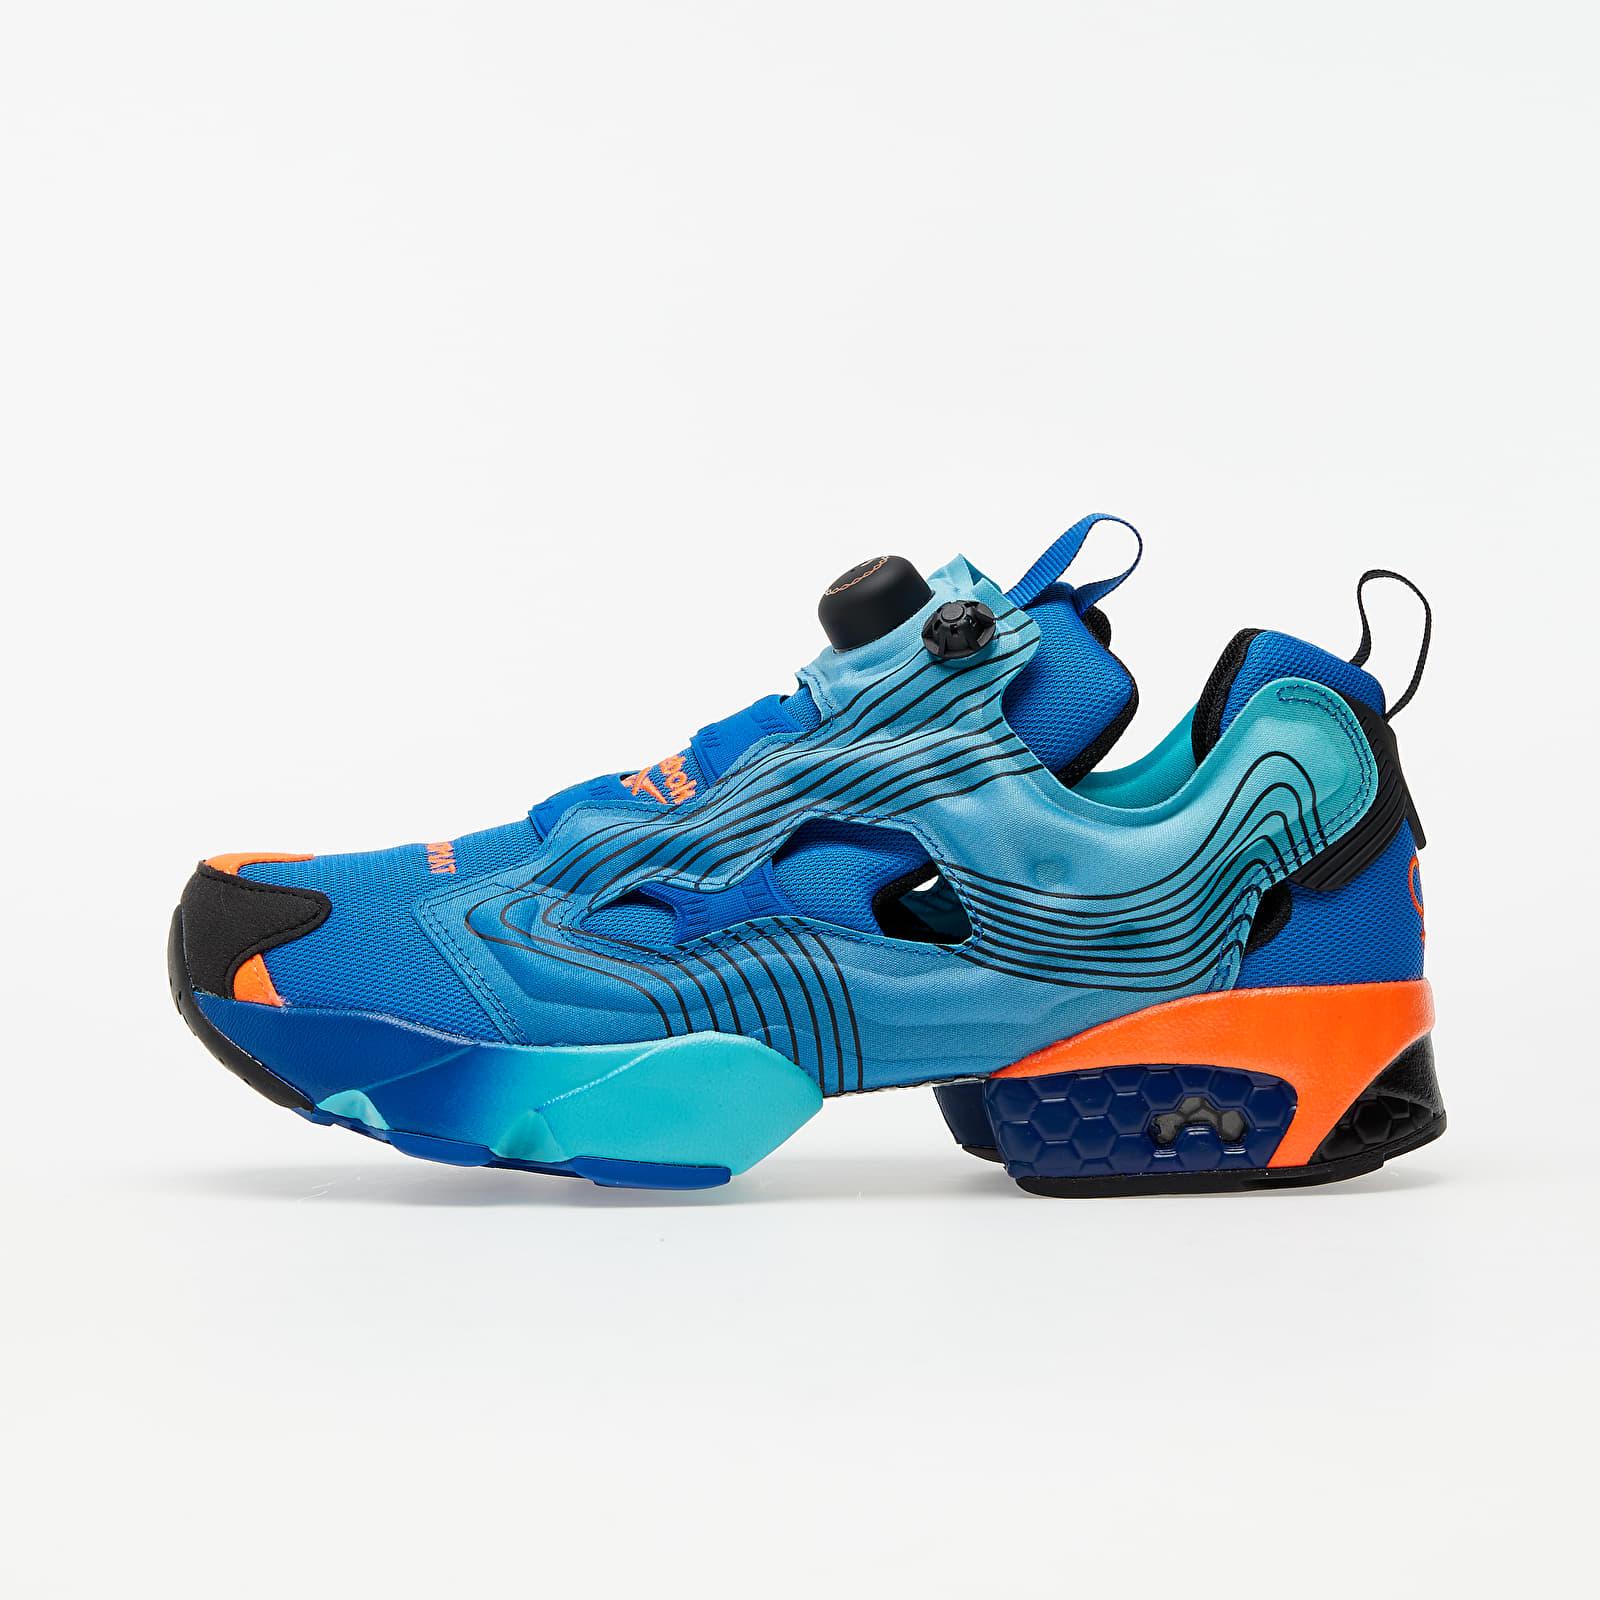 Men's shoes Reebok Instapump Fury Vector Blue/ Glam Blue/ Black